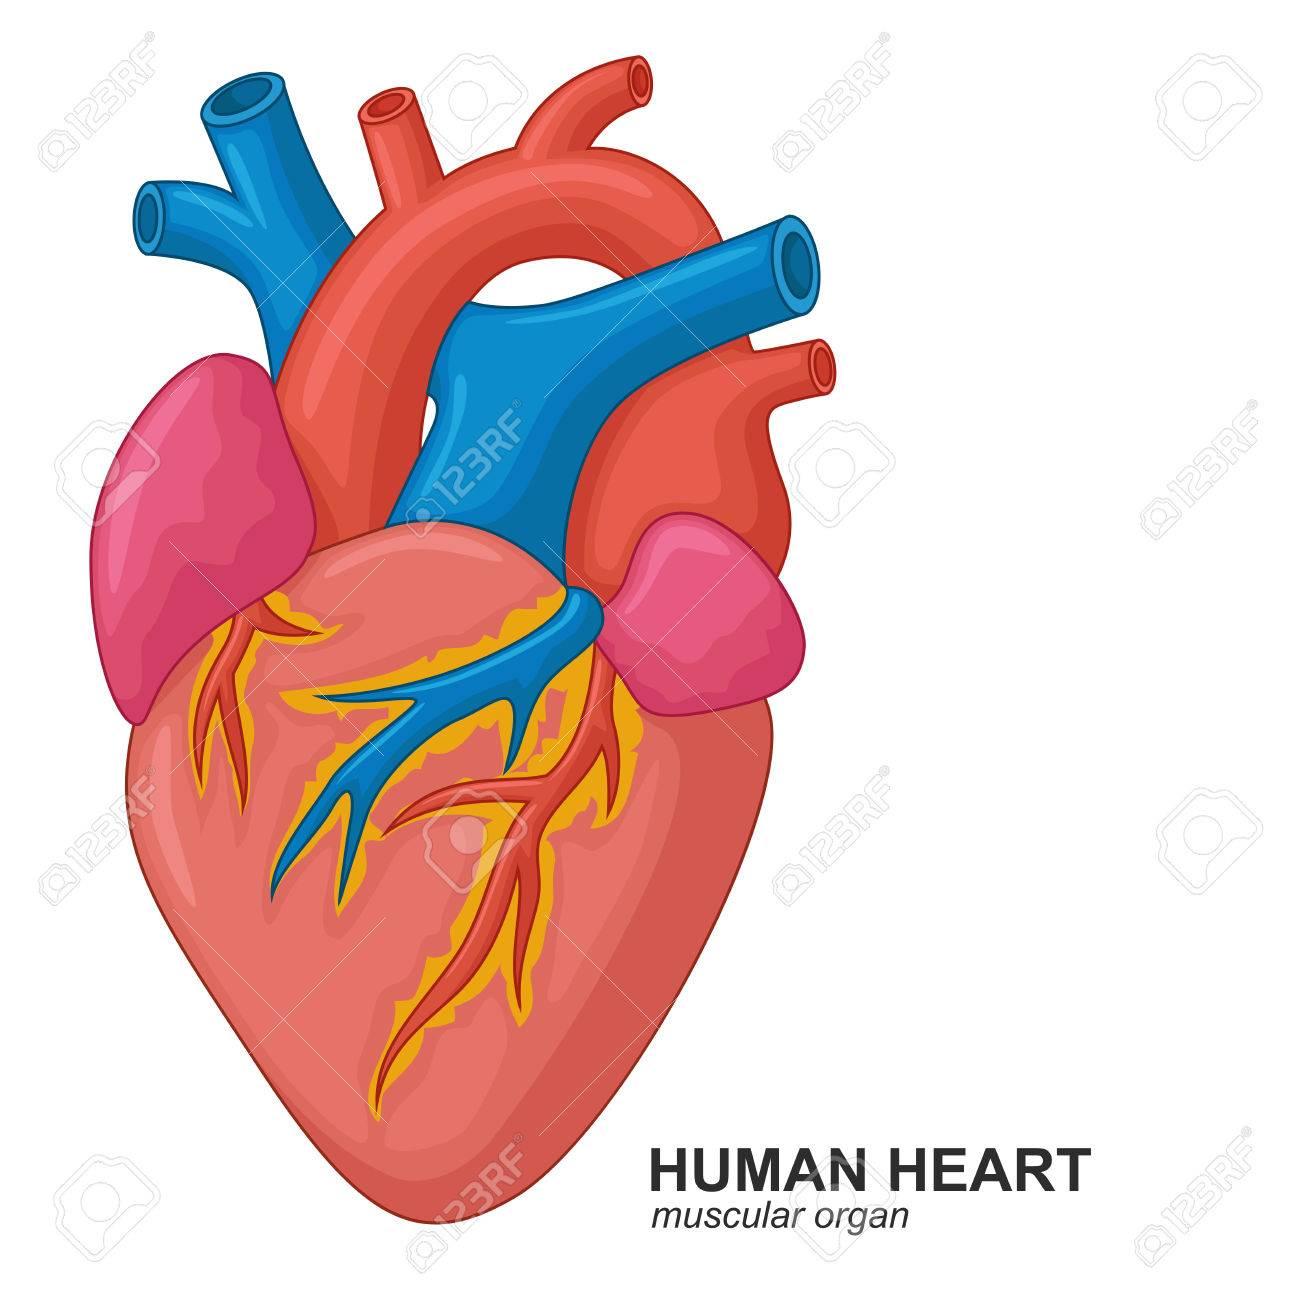 Dessin Coeur Humain dessin animé coeur humain clip art libres de droits , vecteurs et